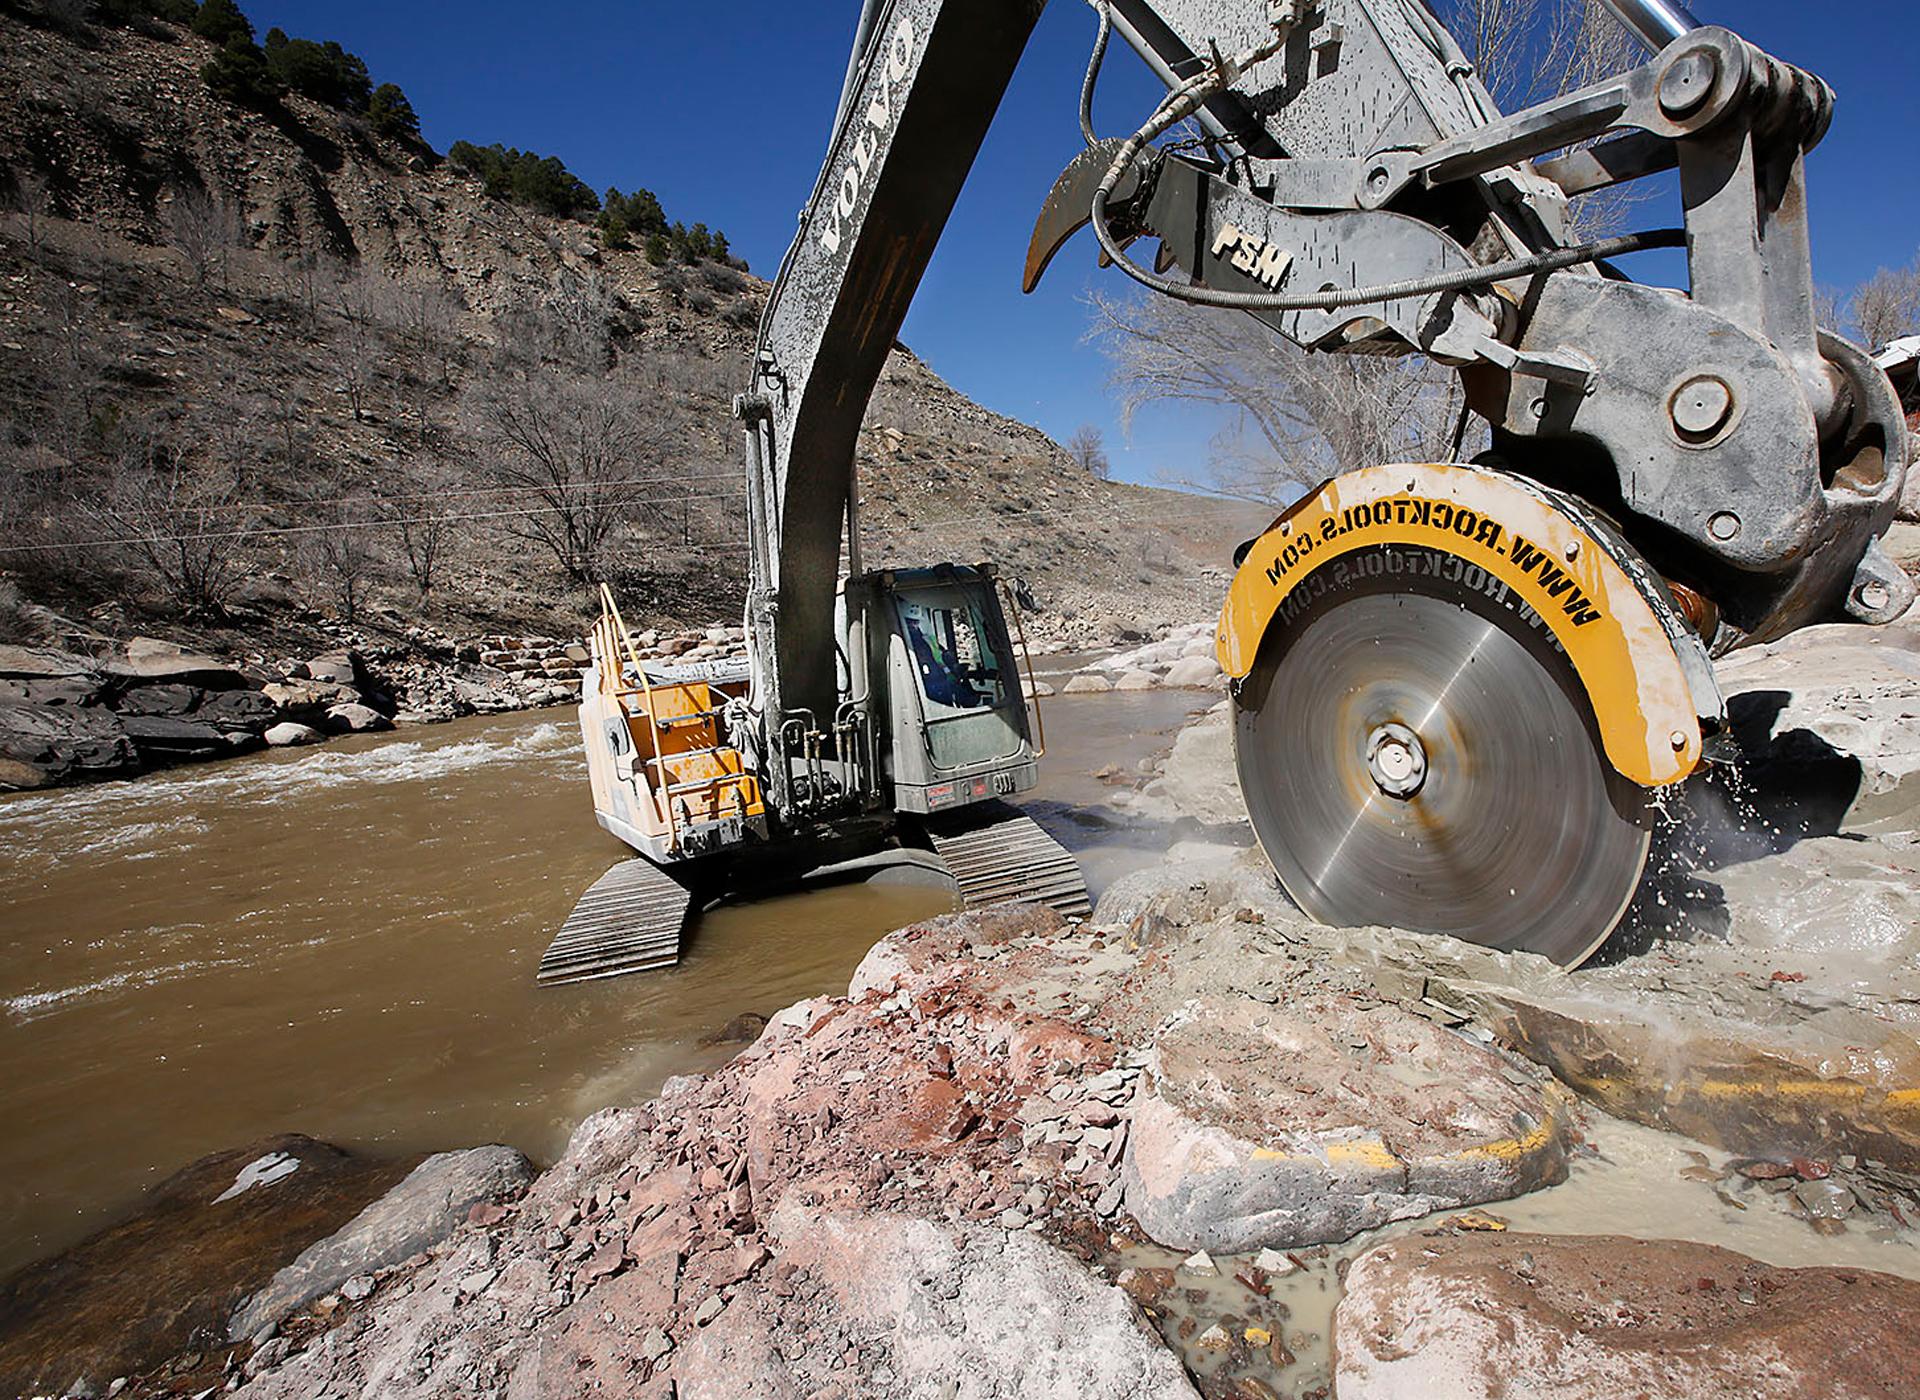 Volvo excavator saws through rock at Durango Whitewater Park in Colorado